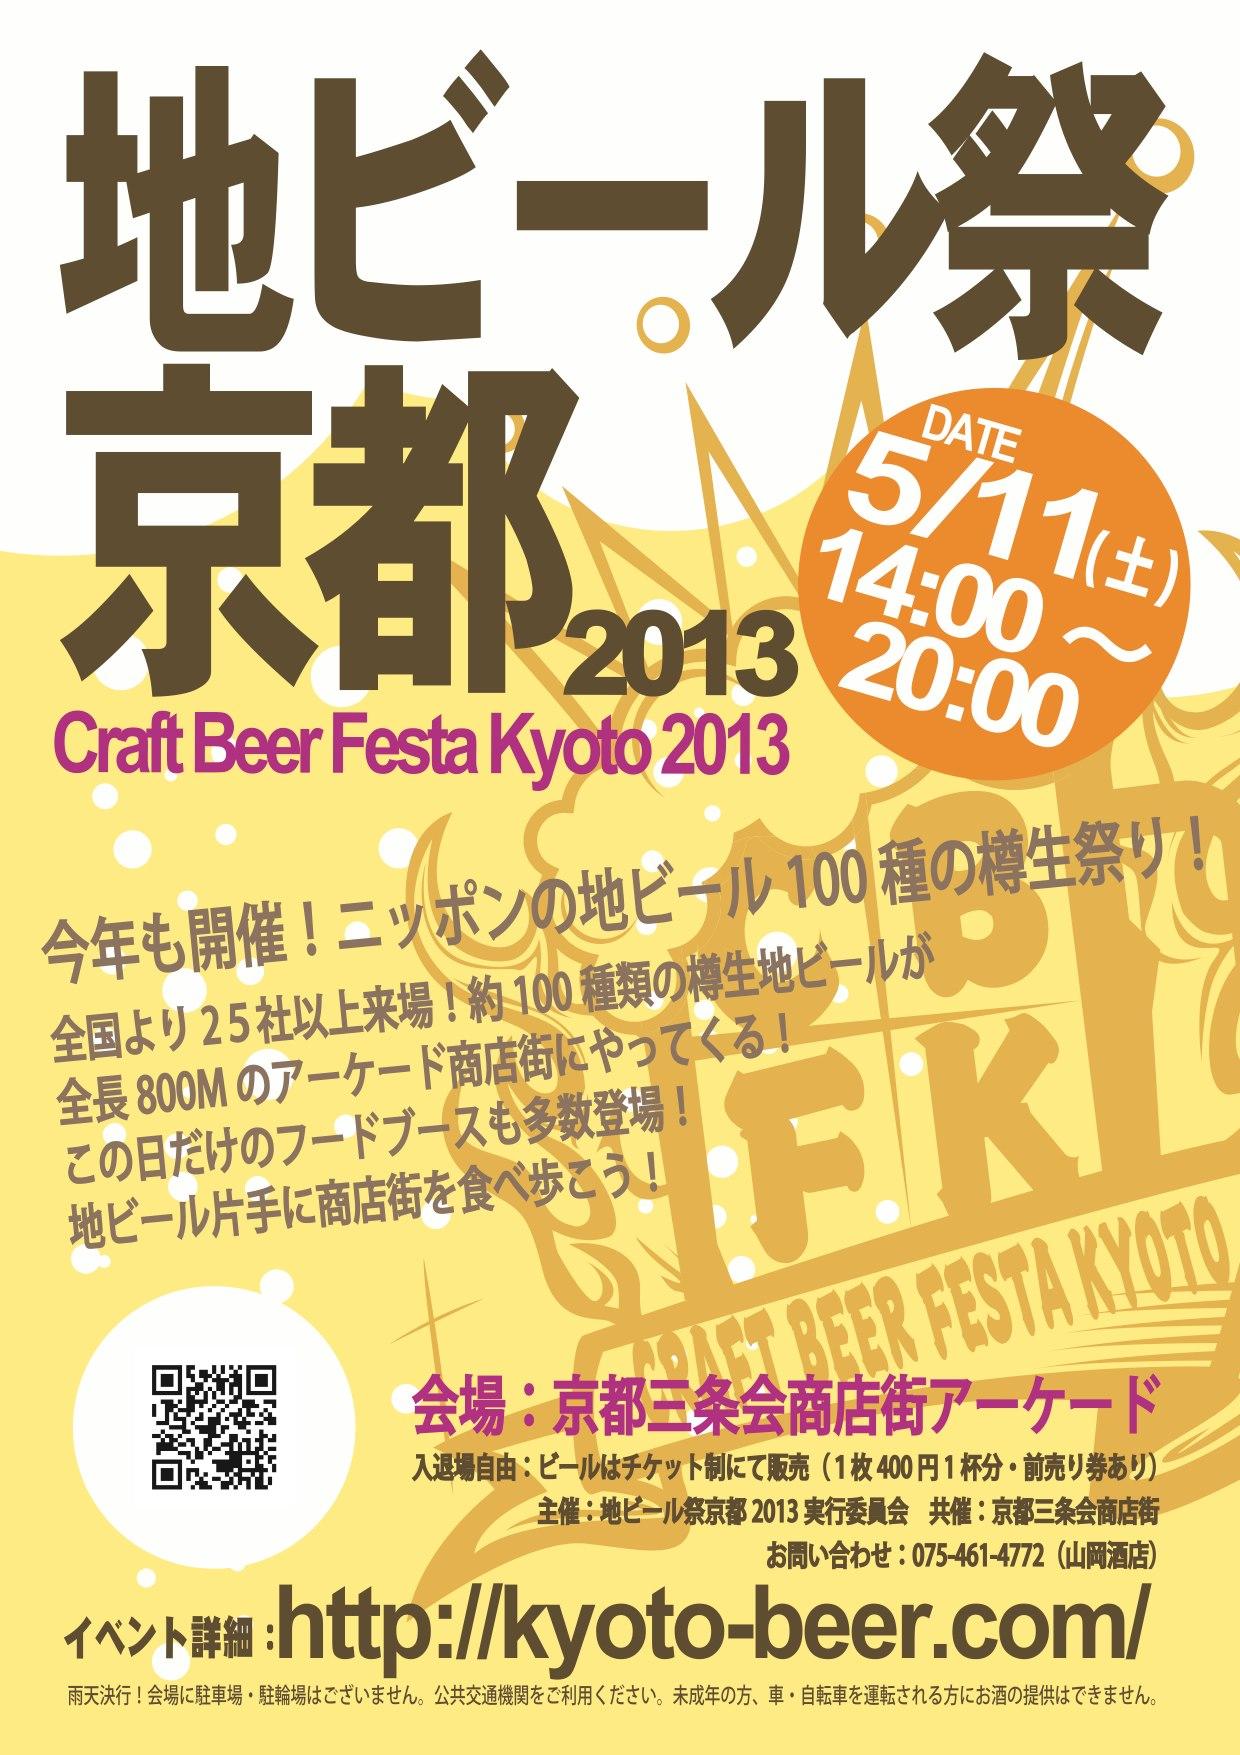 Craft beer festival kyoto 2013 2013 deep kyoto for Japan craft beer association